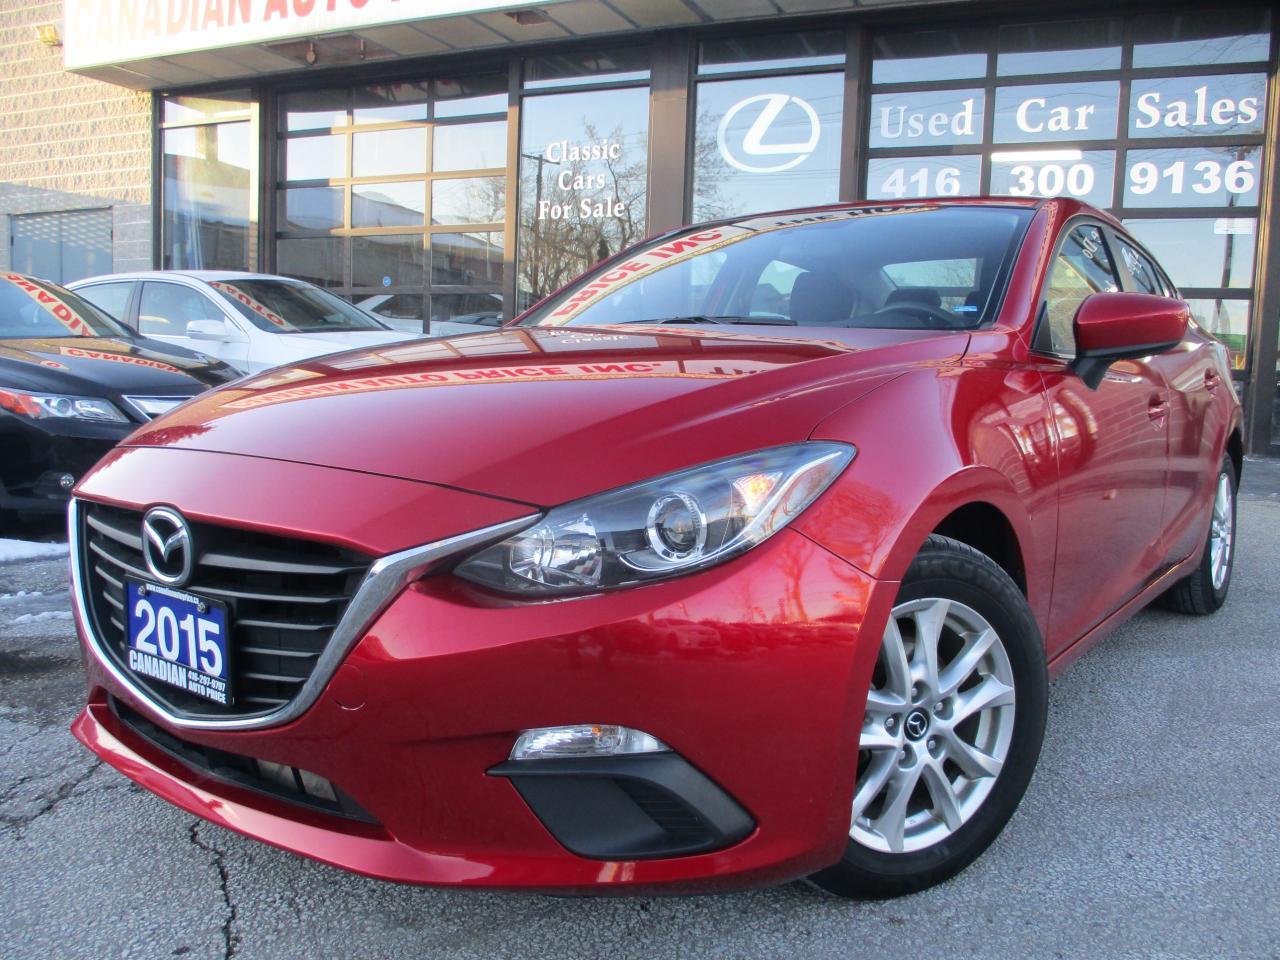 2015 Mazda MAZDA3 GS-SKY-BACK UP CAMERA-BLUETOOTH-PUSH BATTON START-